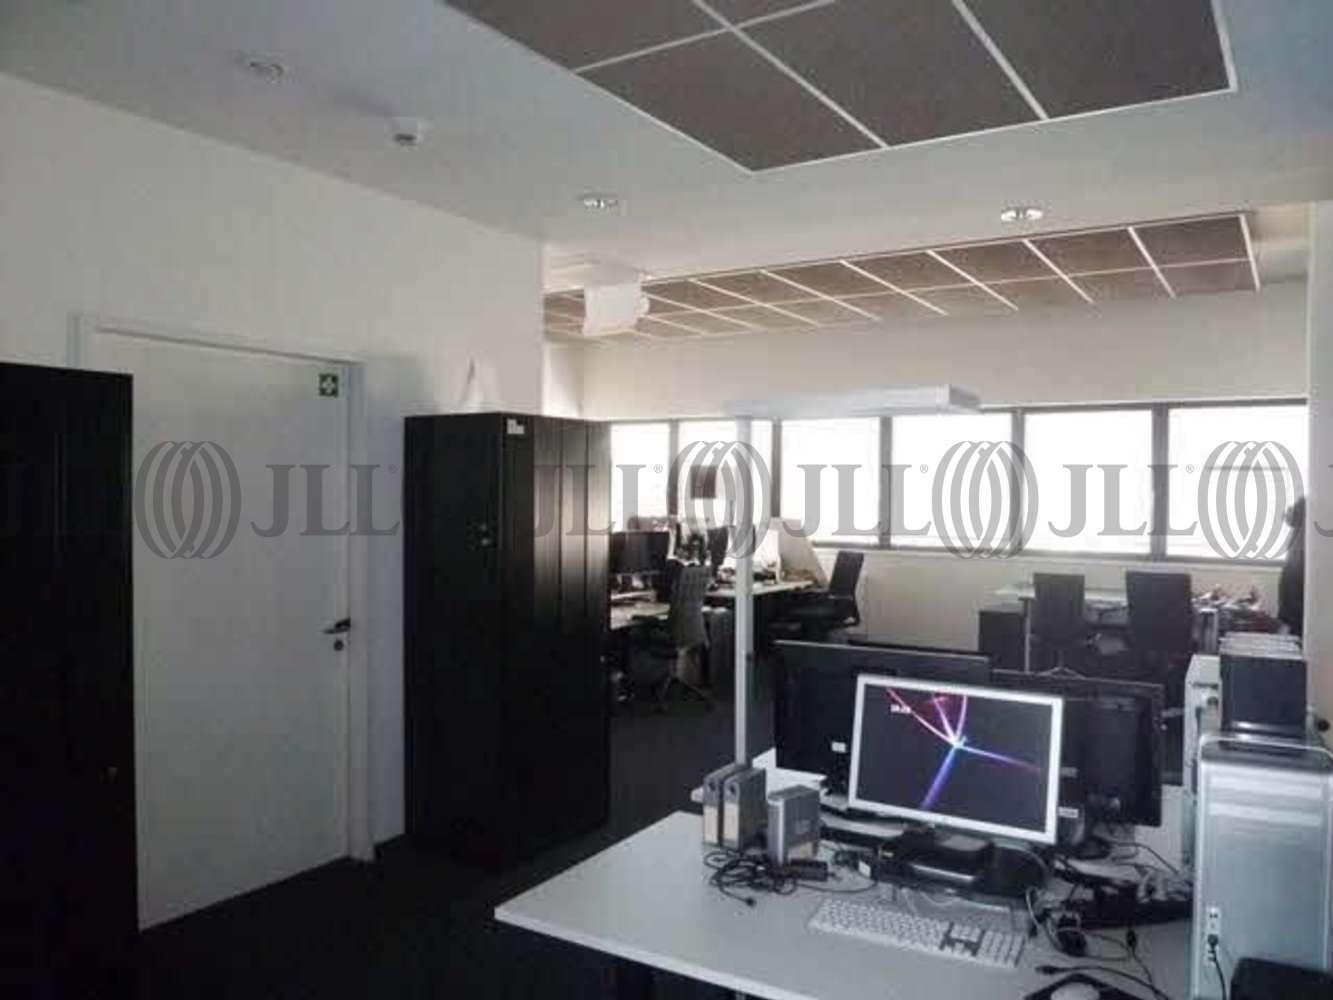 Büros Frankfurt am main, 60314 - Büro - Frankfurt am Main, Ostend - F1313 - 9410751